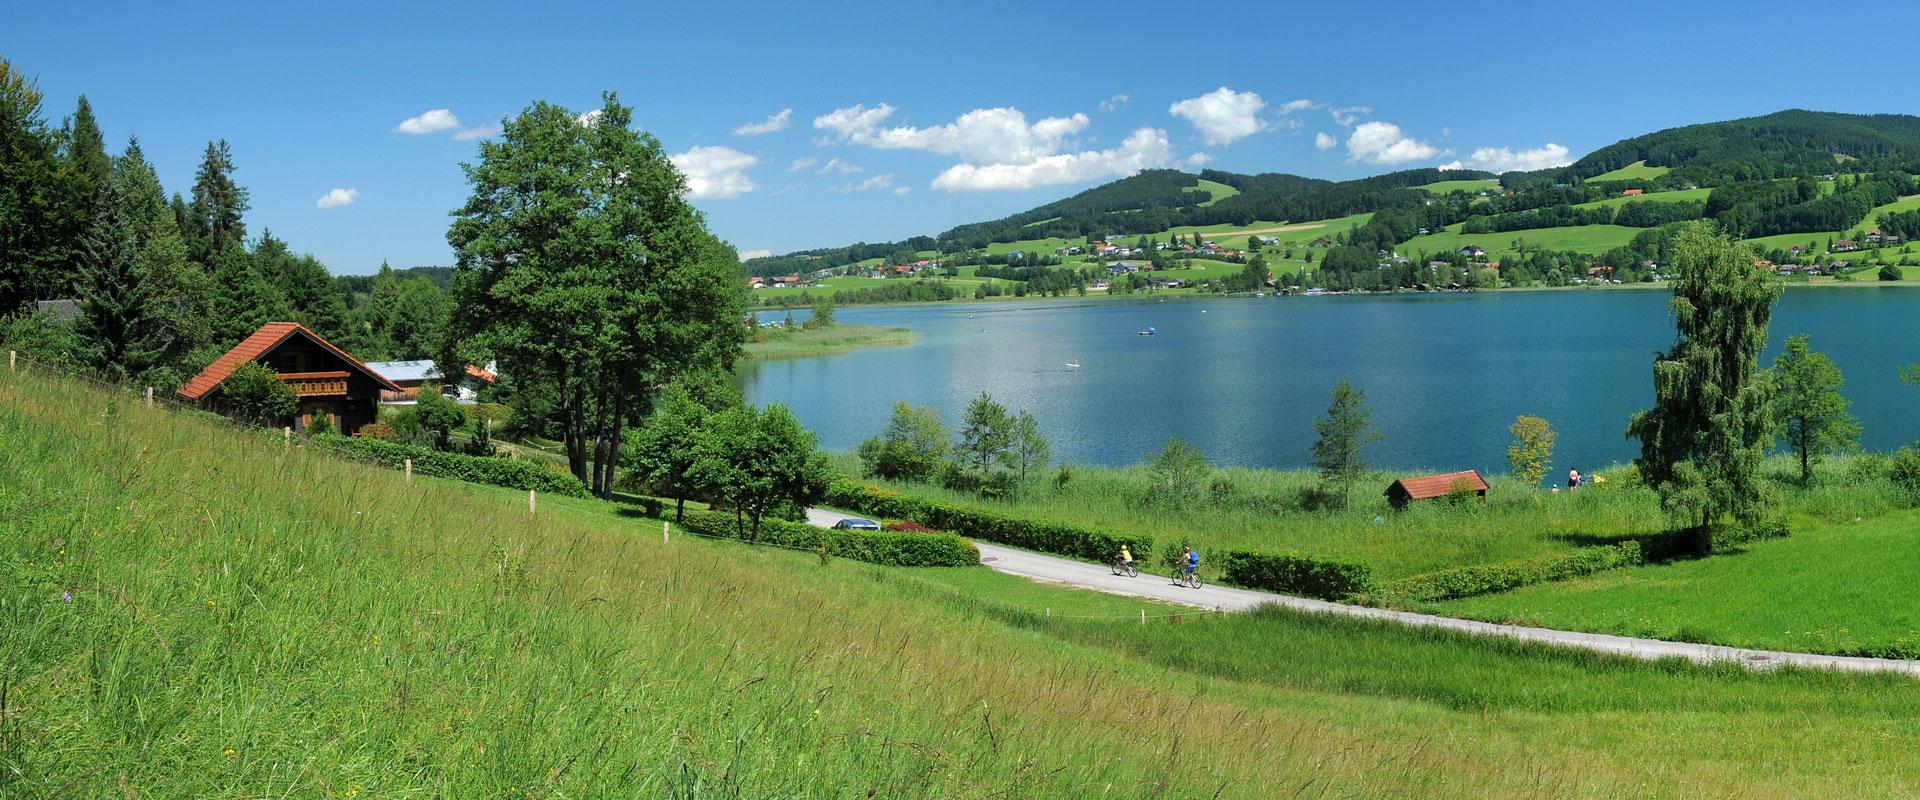 Cykelferie i Salzburger Seenland